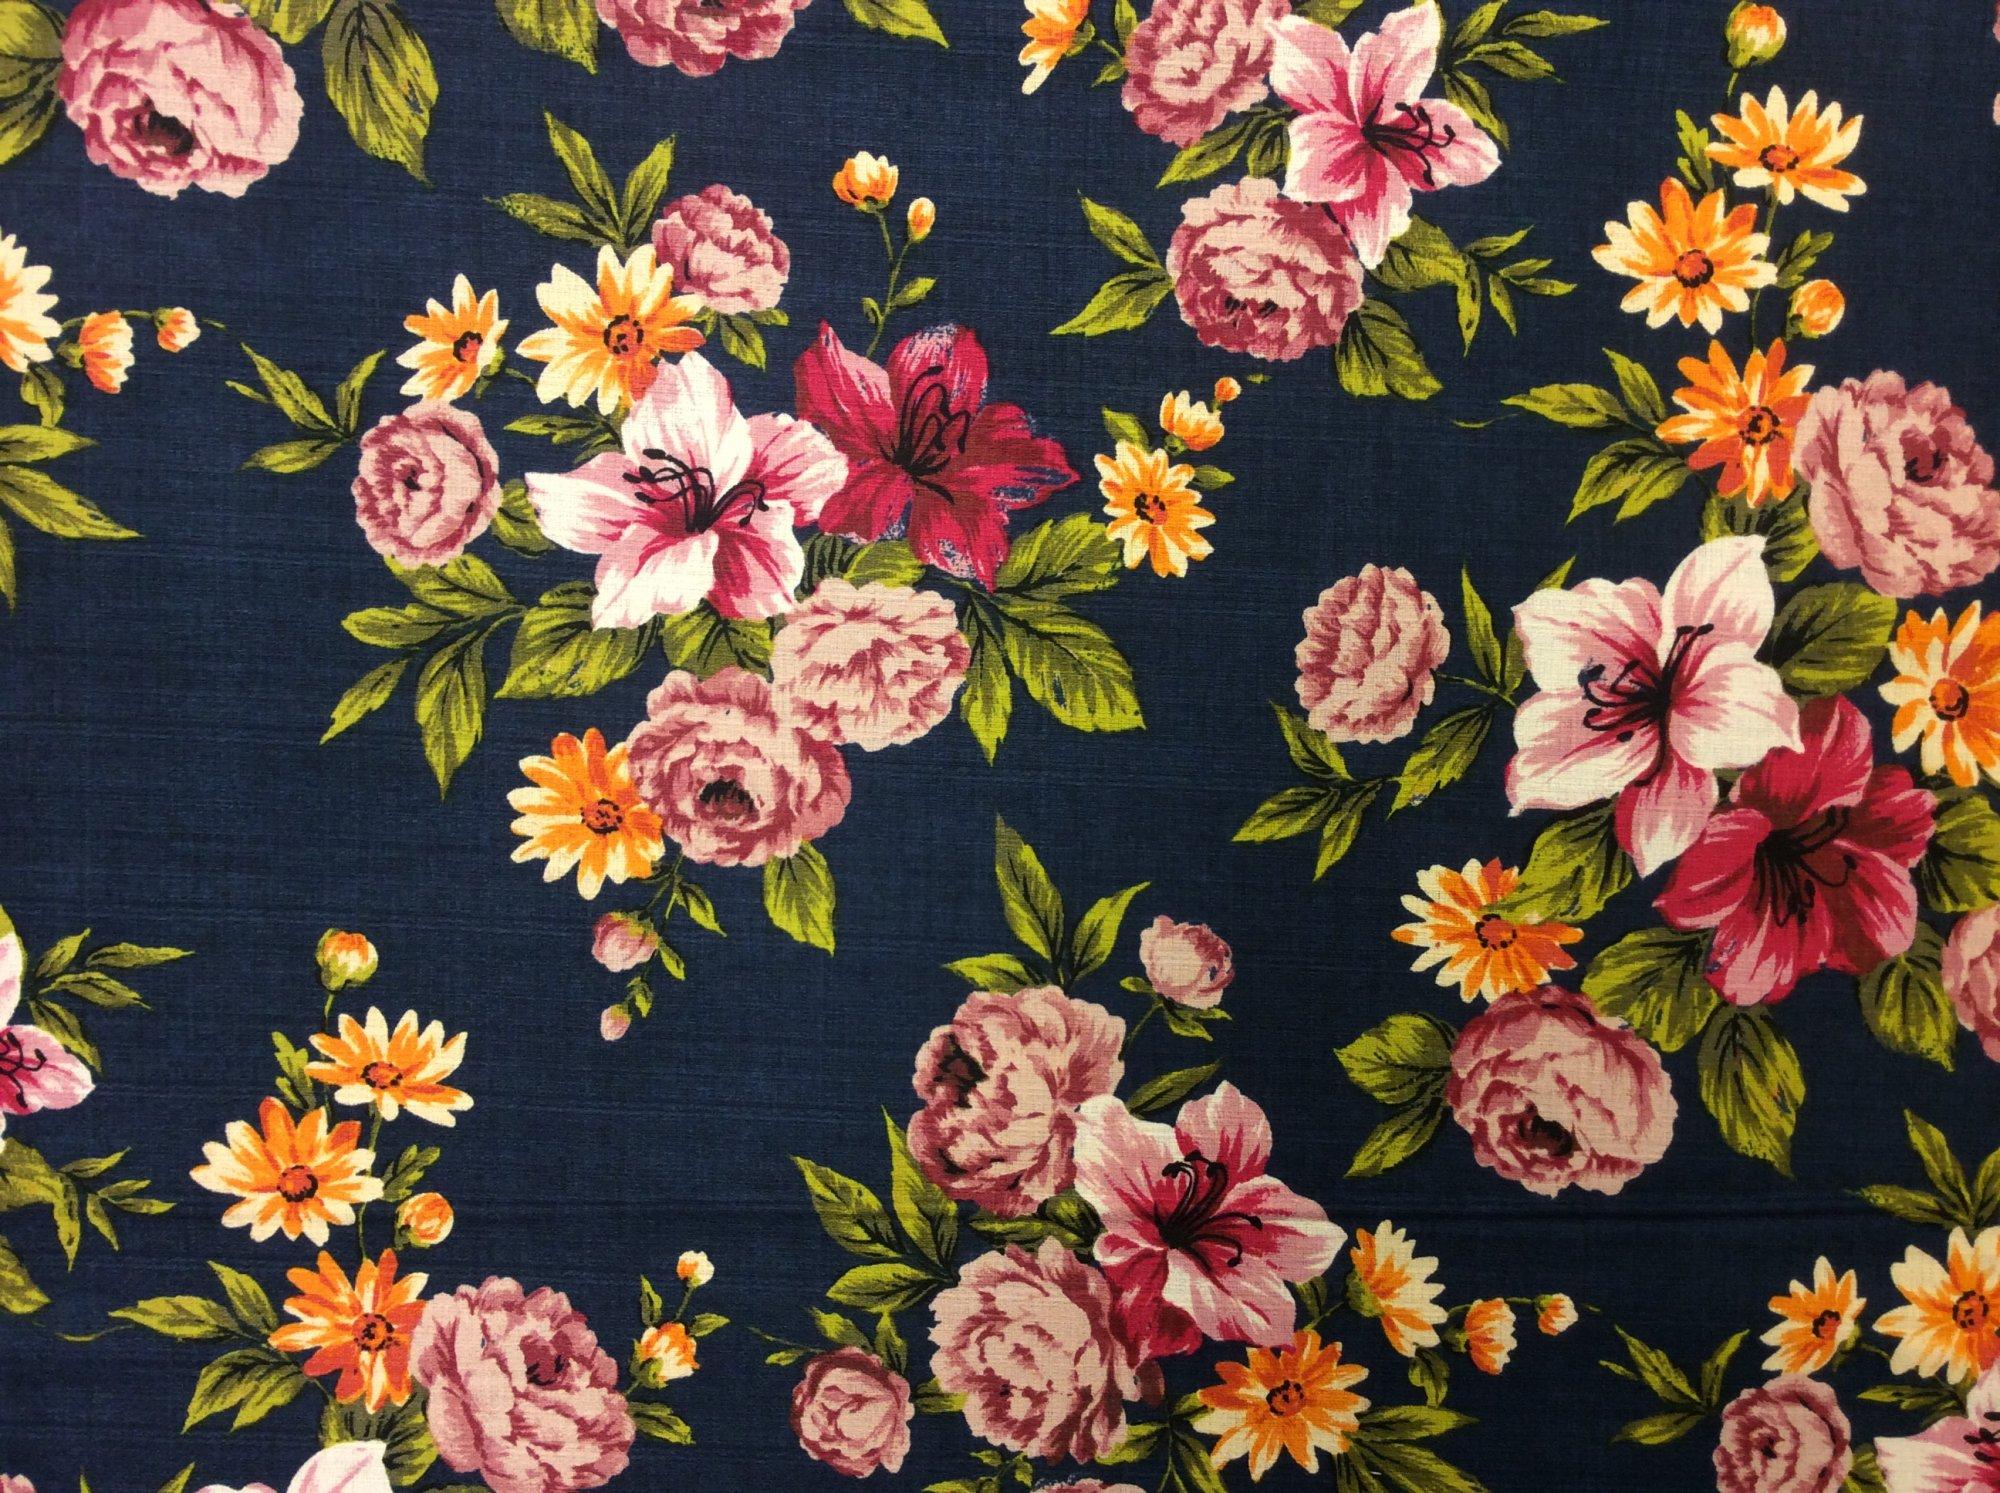 Ella Blue Australia Collection Retro Barkcloth Style Textured Floral Garden Print Cotton Fabric EB01